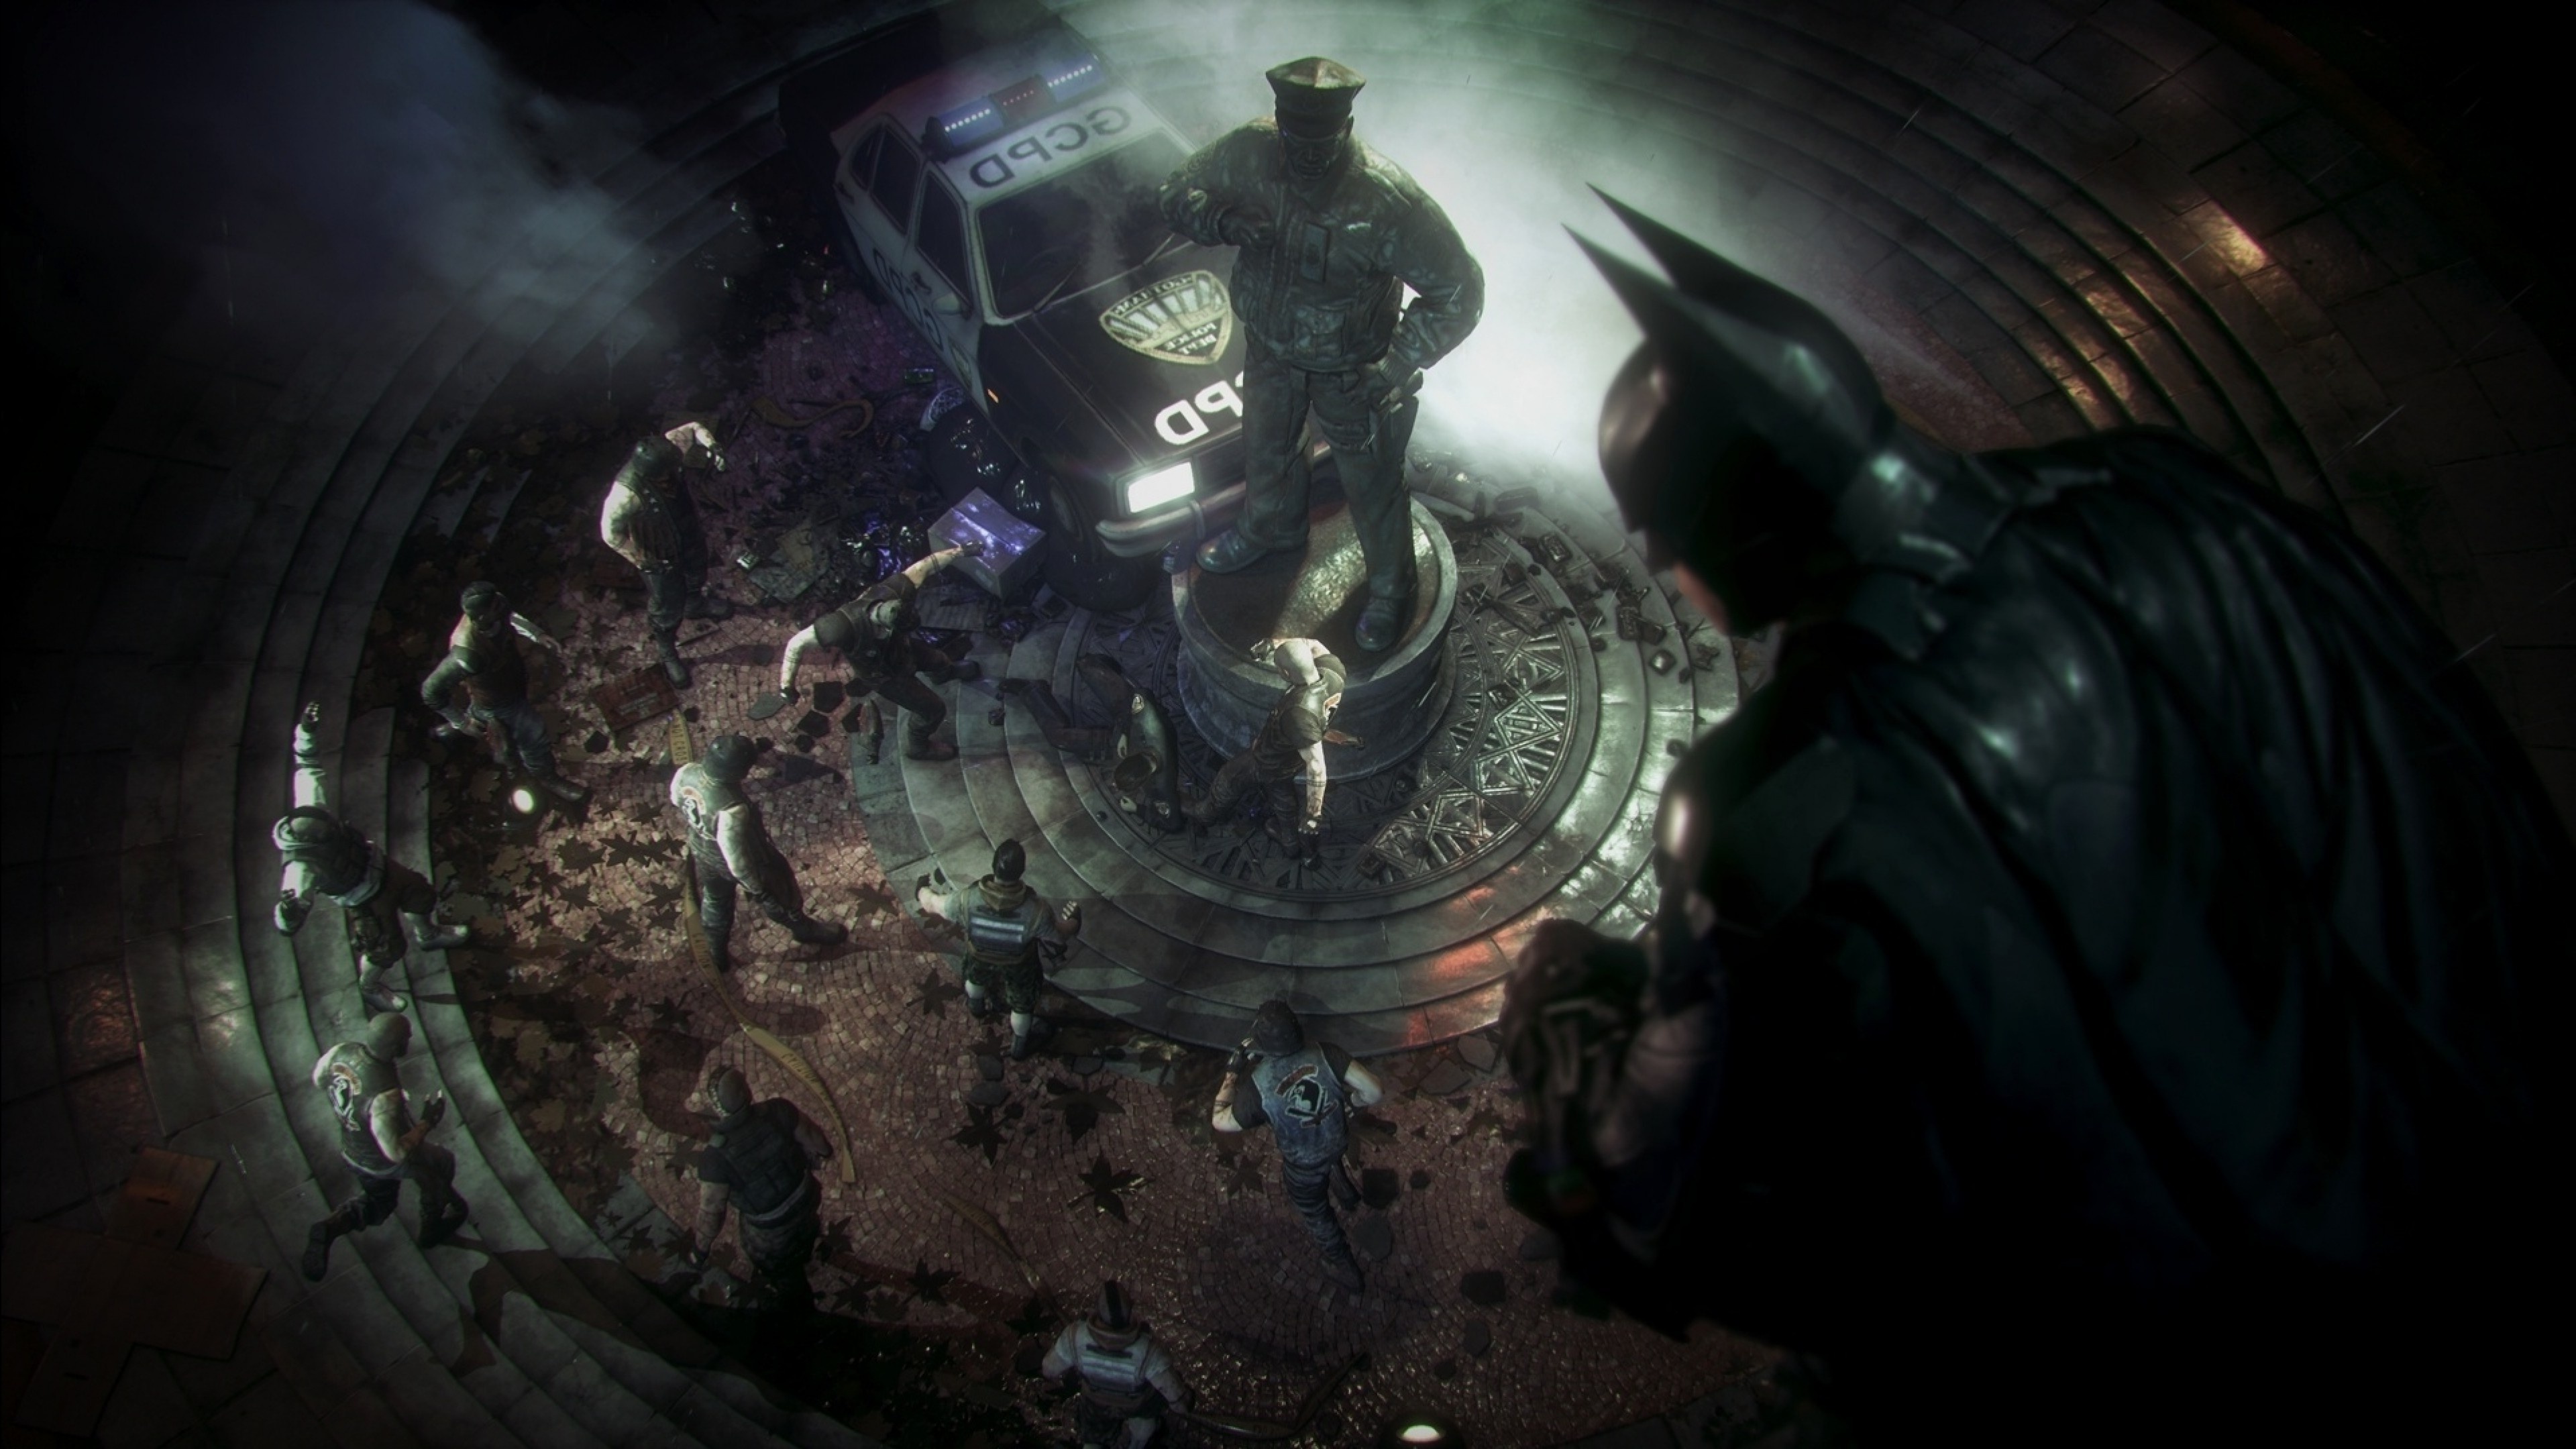 Batman: Arkham Knight, Rocksteady Studios, Batman, Gotham City, Video Games